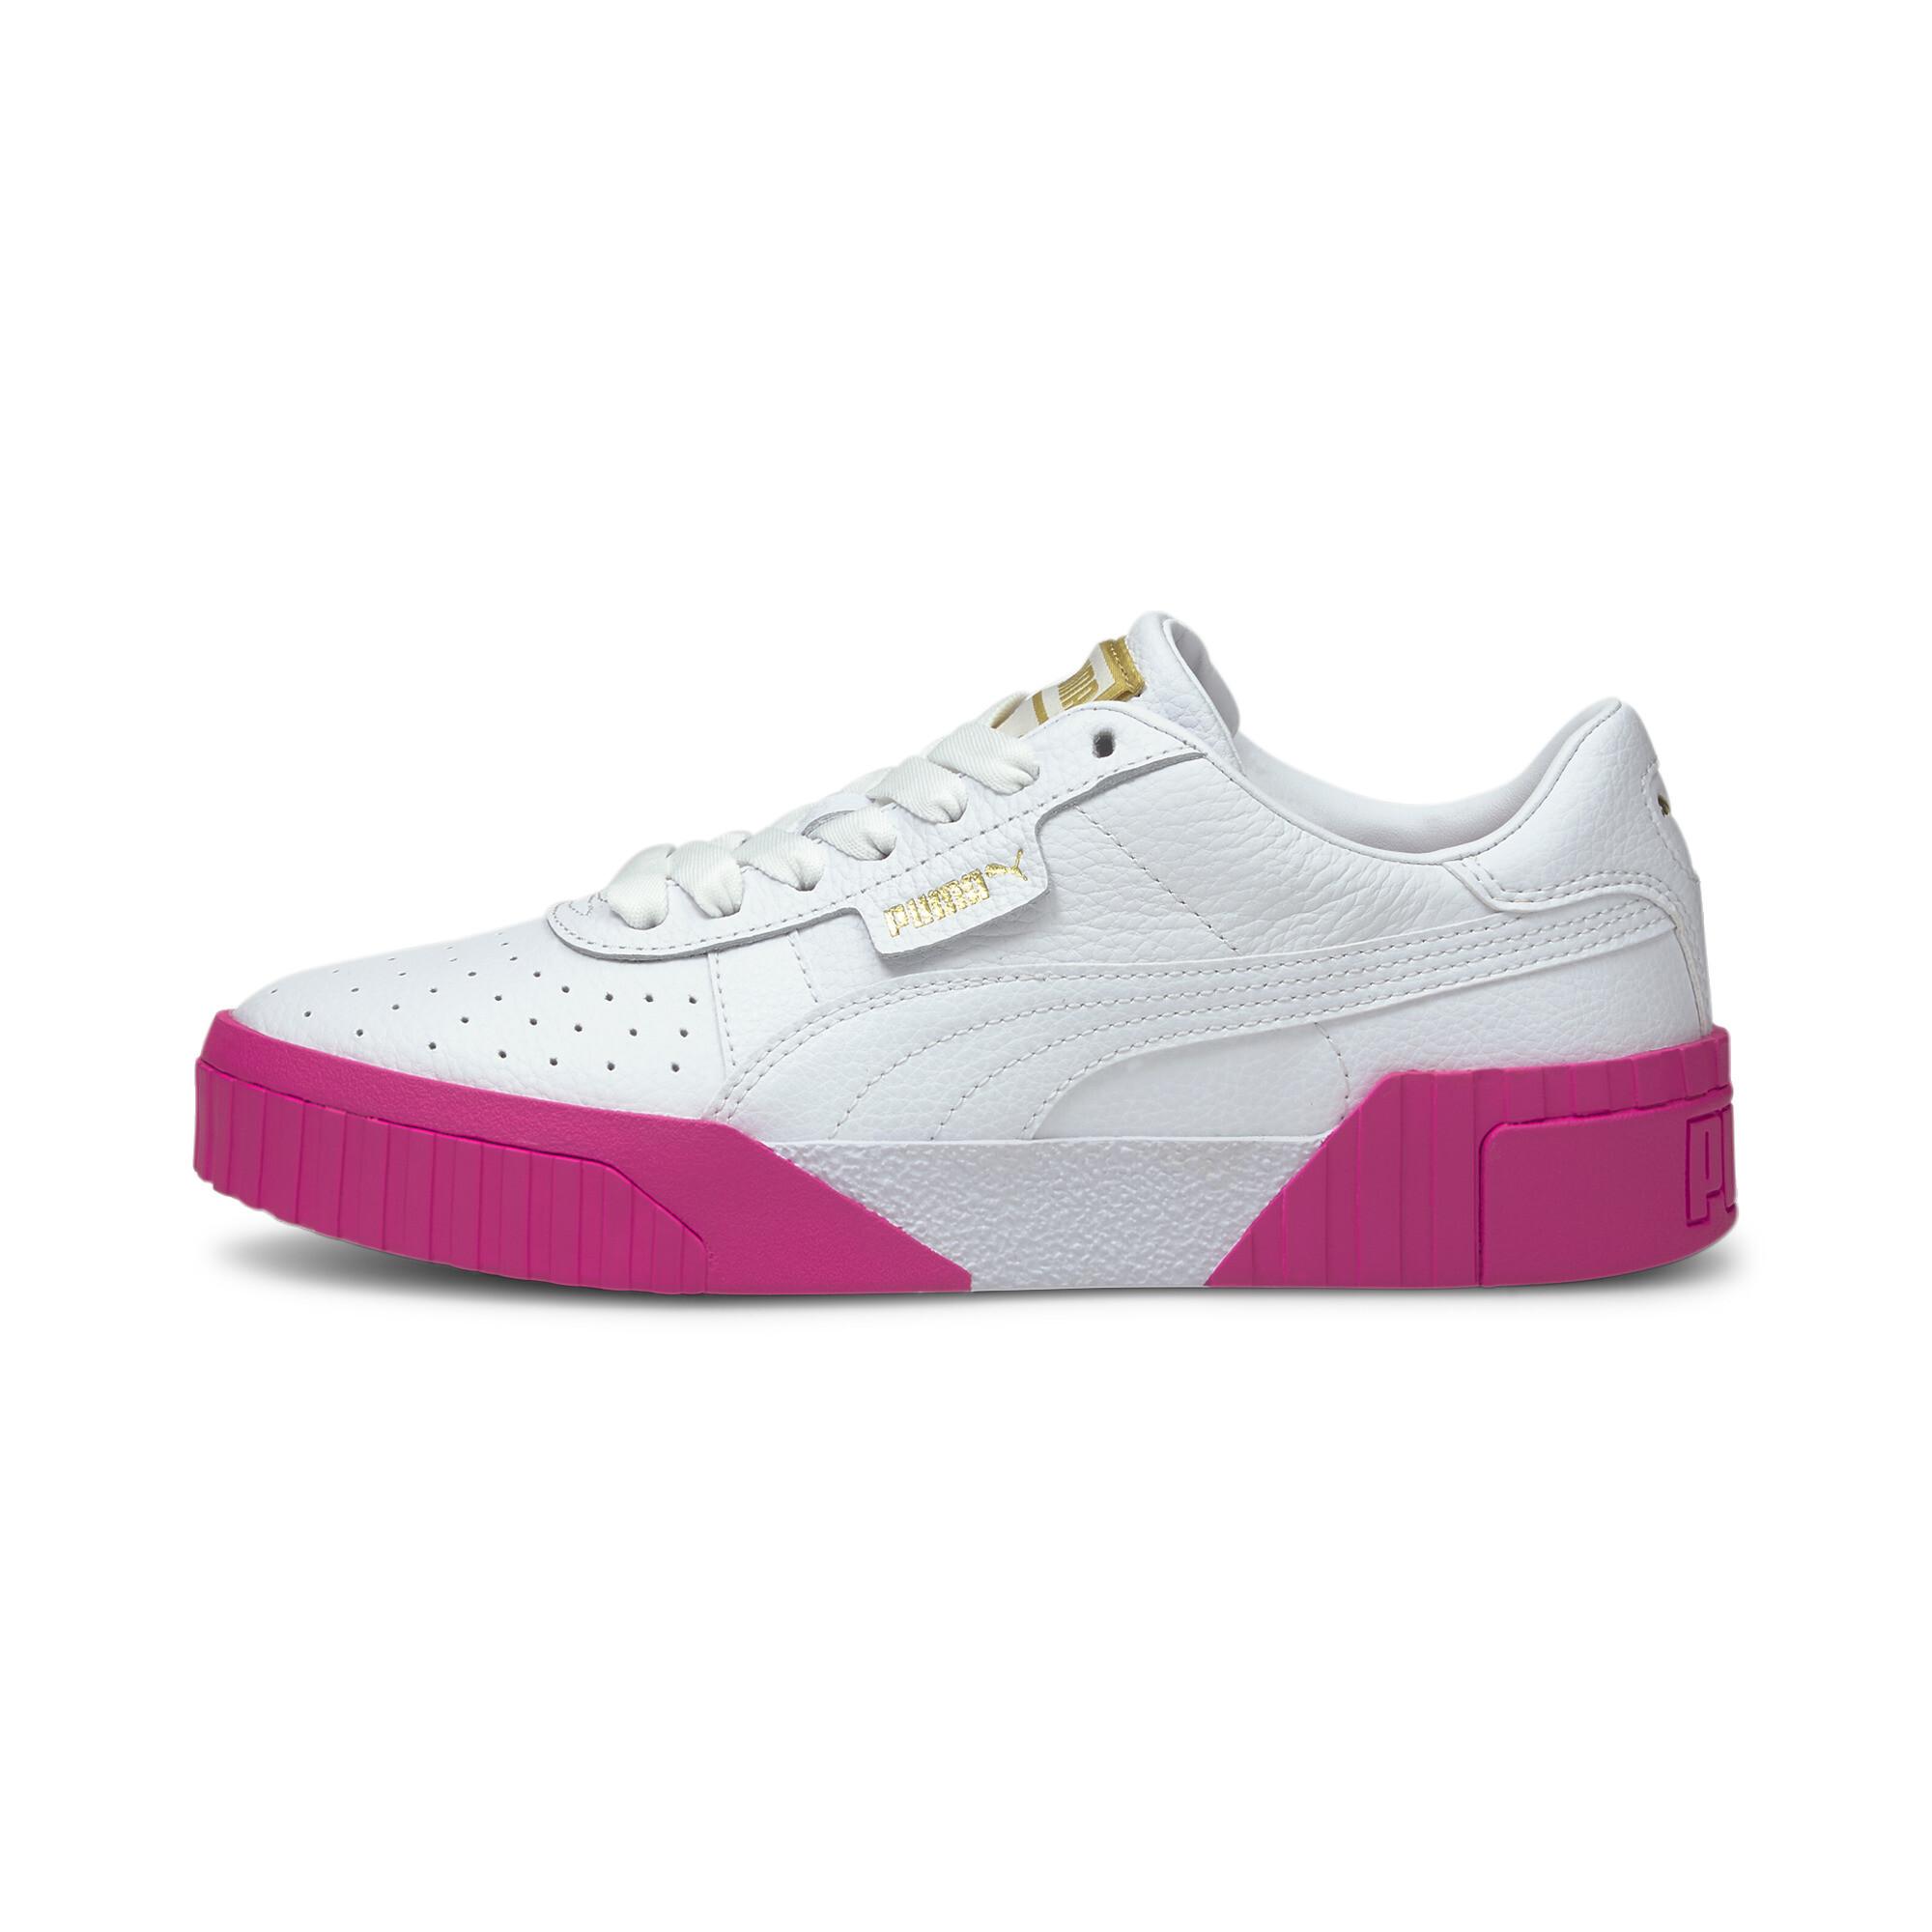 PUMA-Women-039-s-Cali-Sneakers thumbnail 4